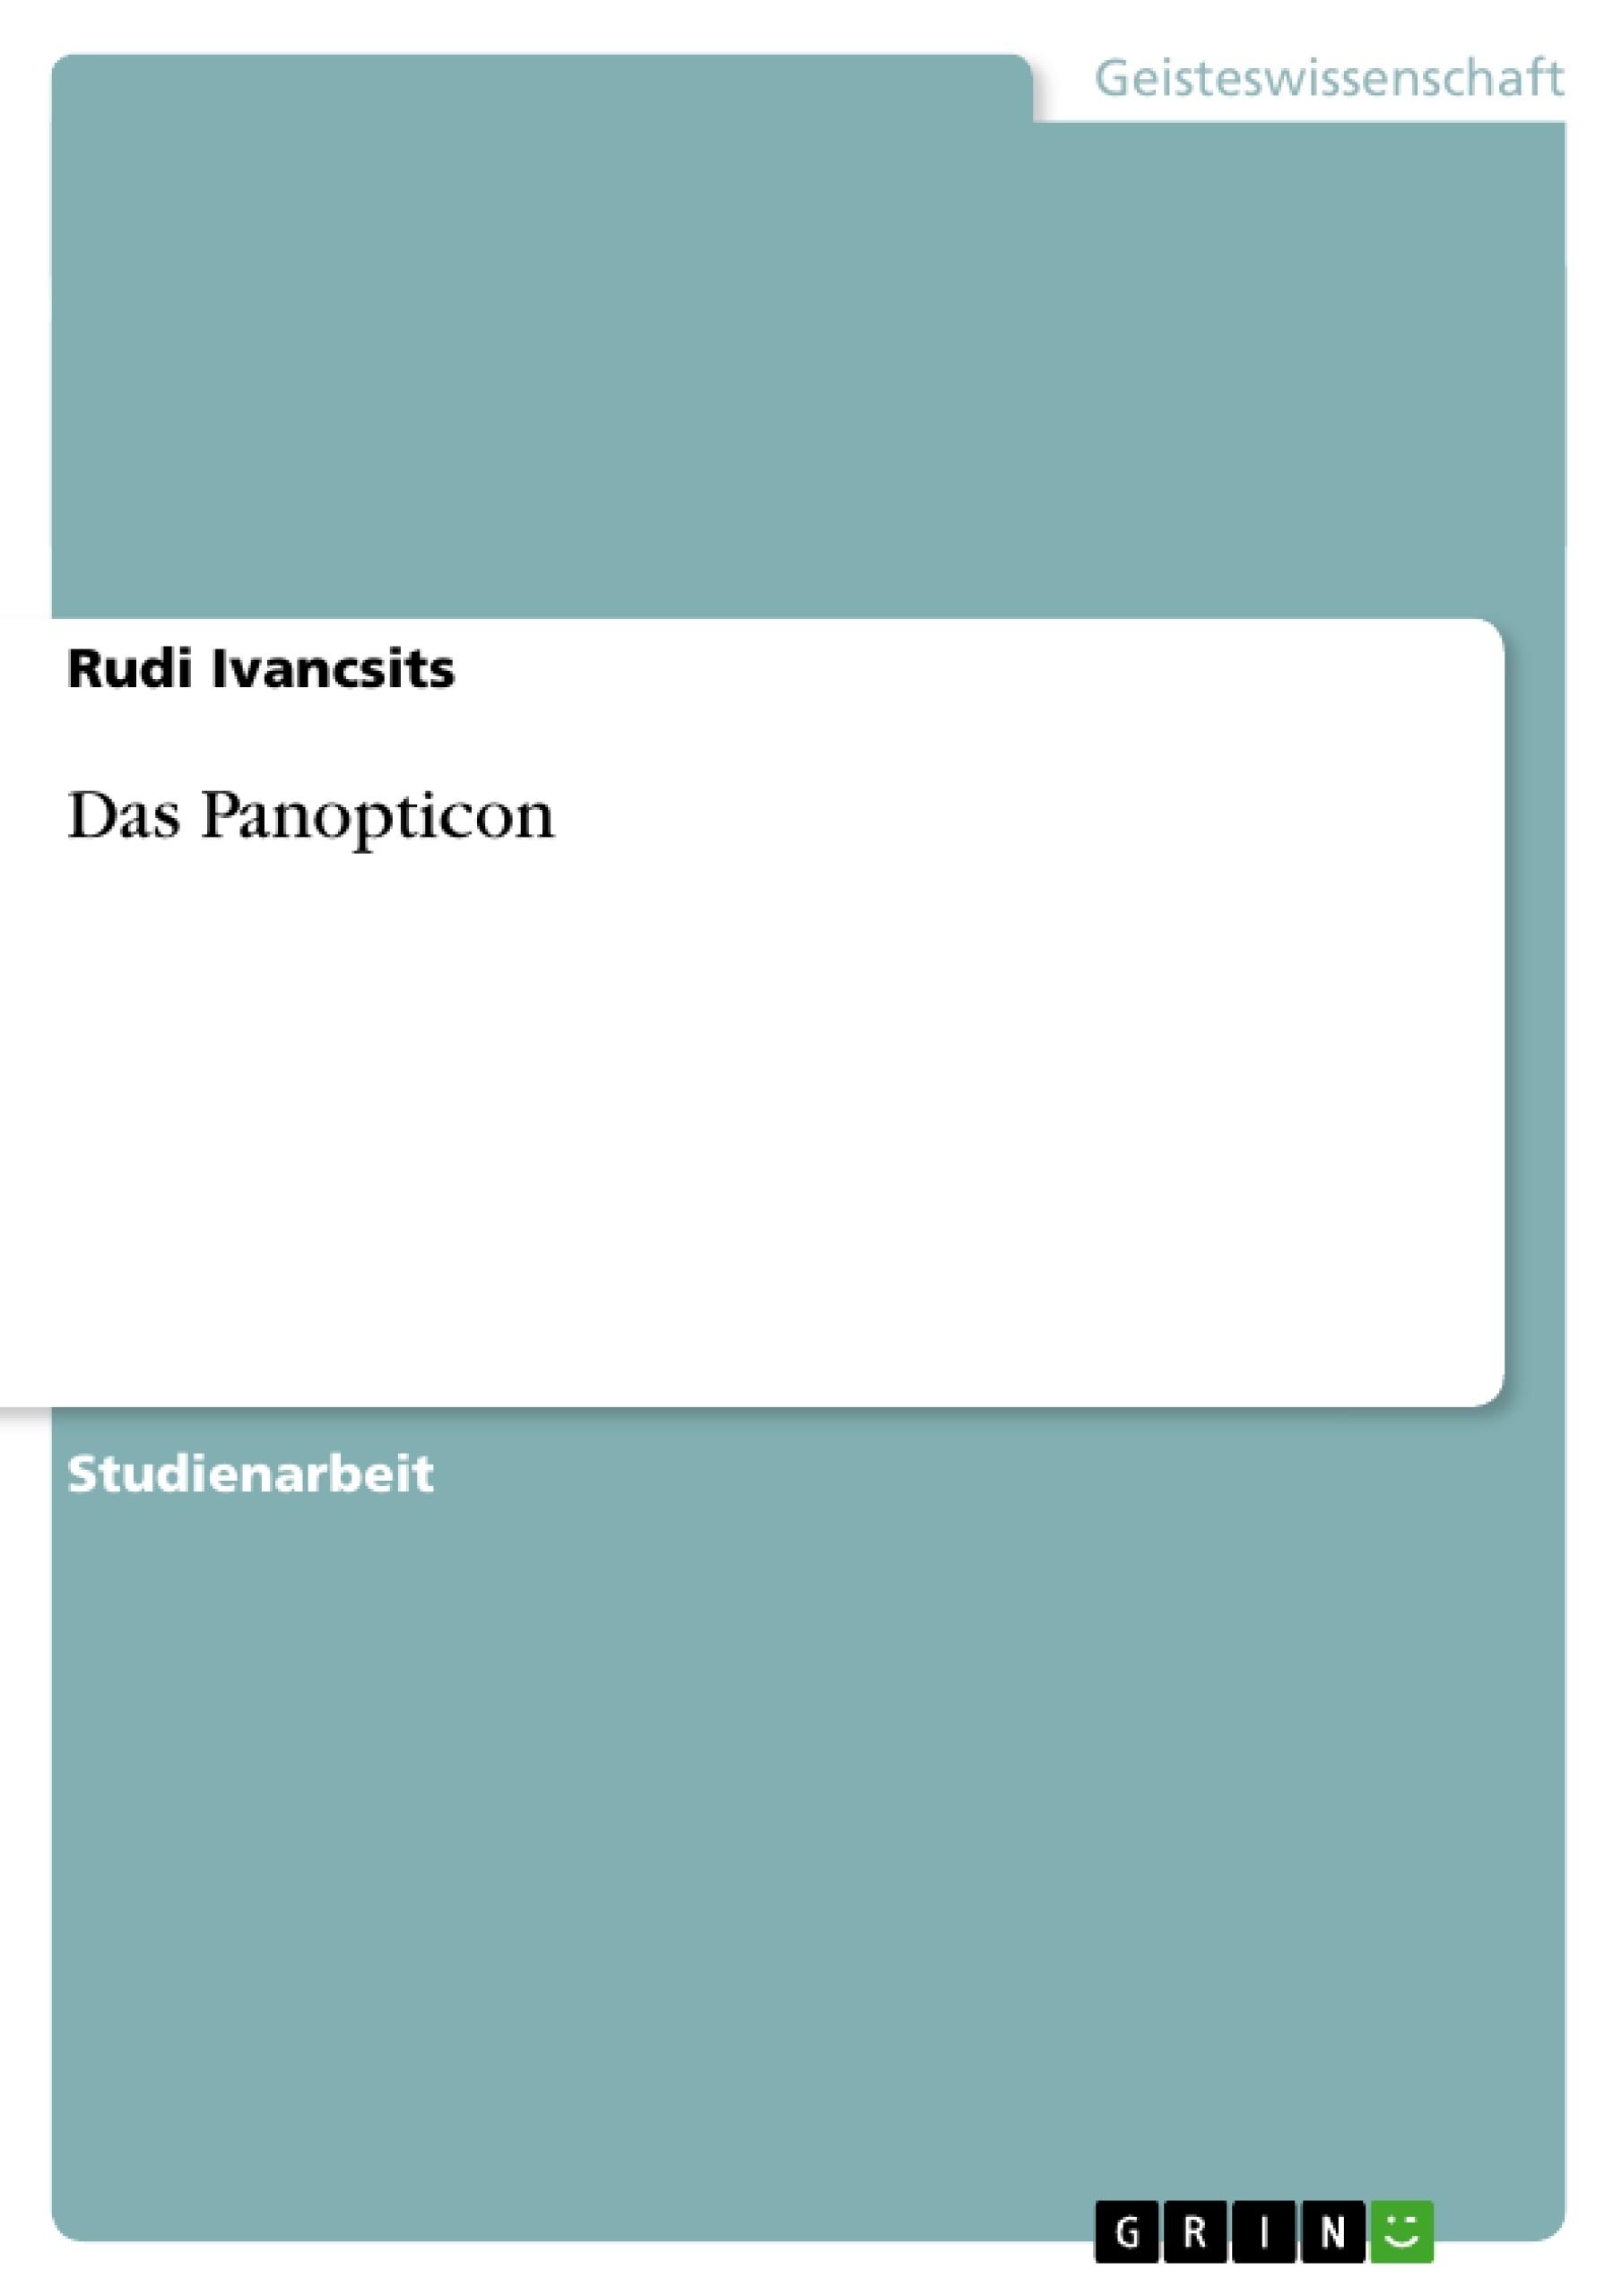 Titel: Das Panopticon